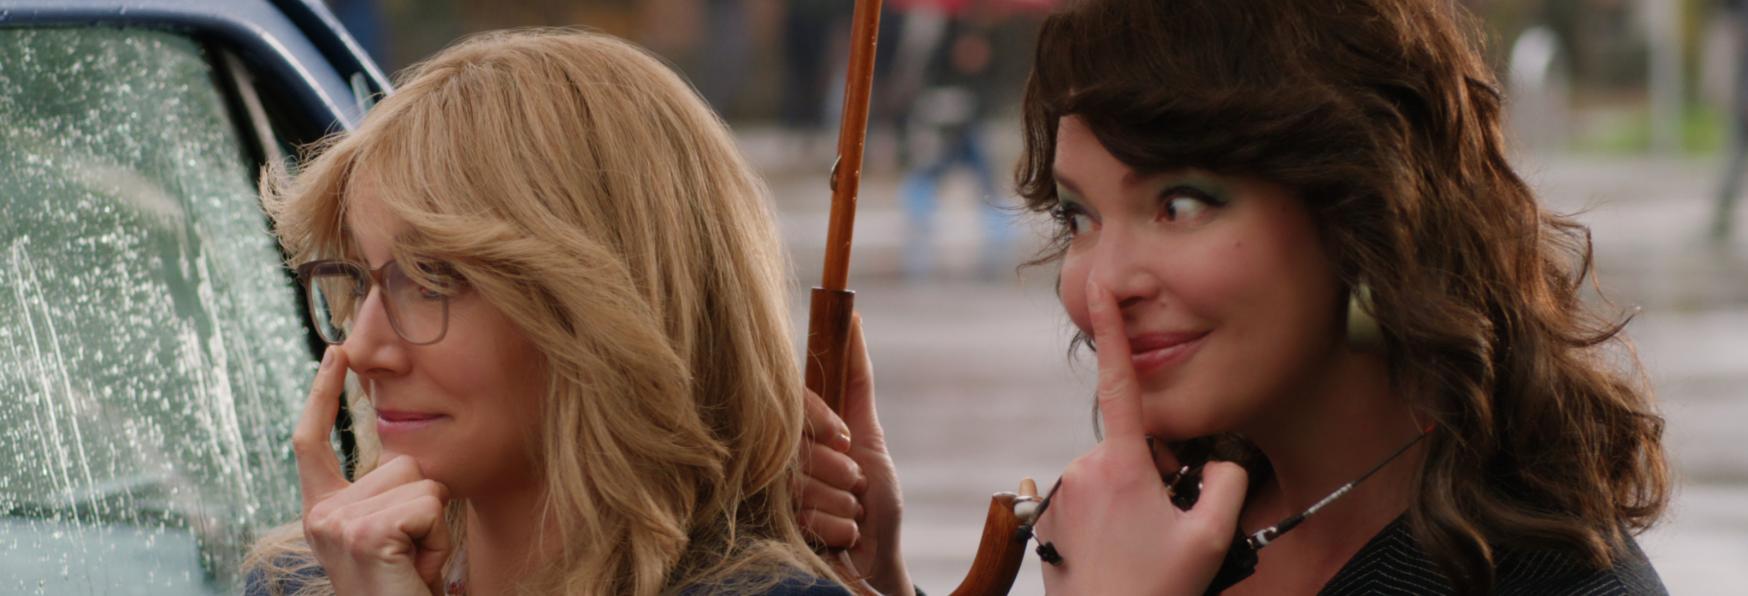 Sarah Chalke parla di una Possibile 2° Stagione di Firefly Lane e di una Reunion di Scrubs